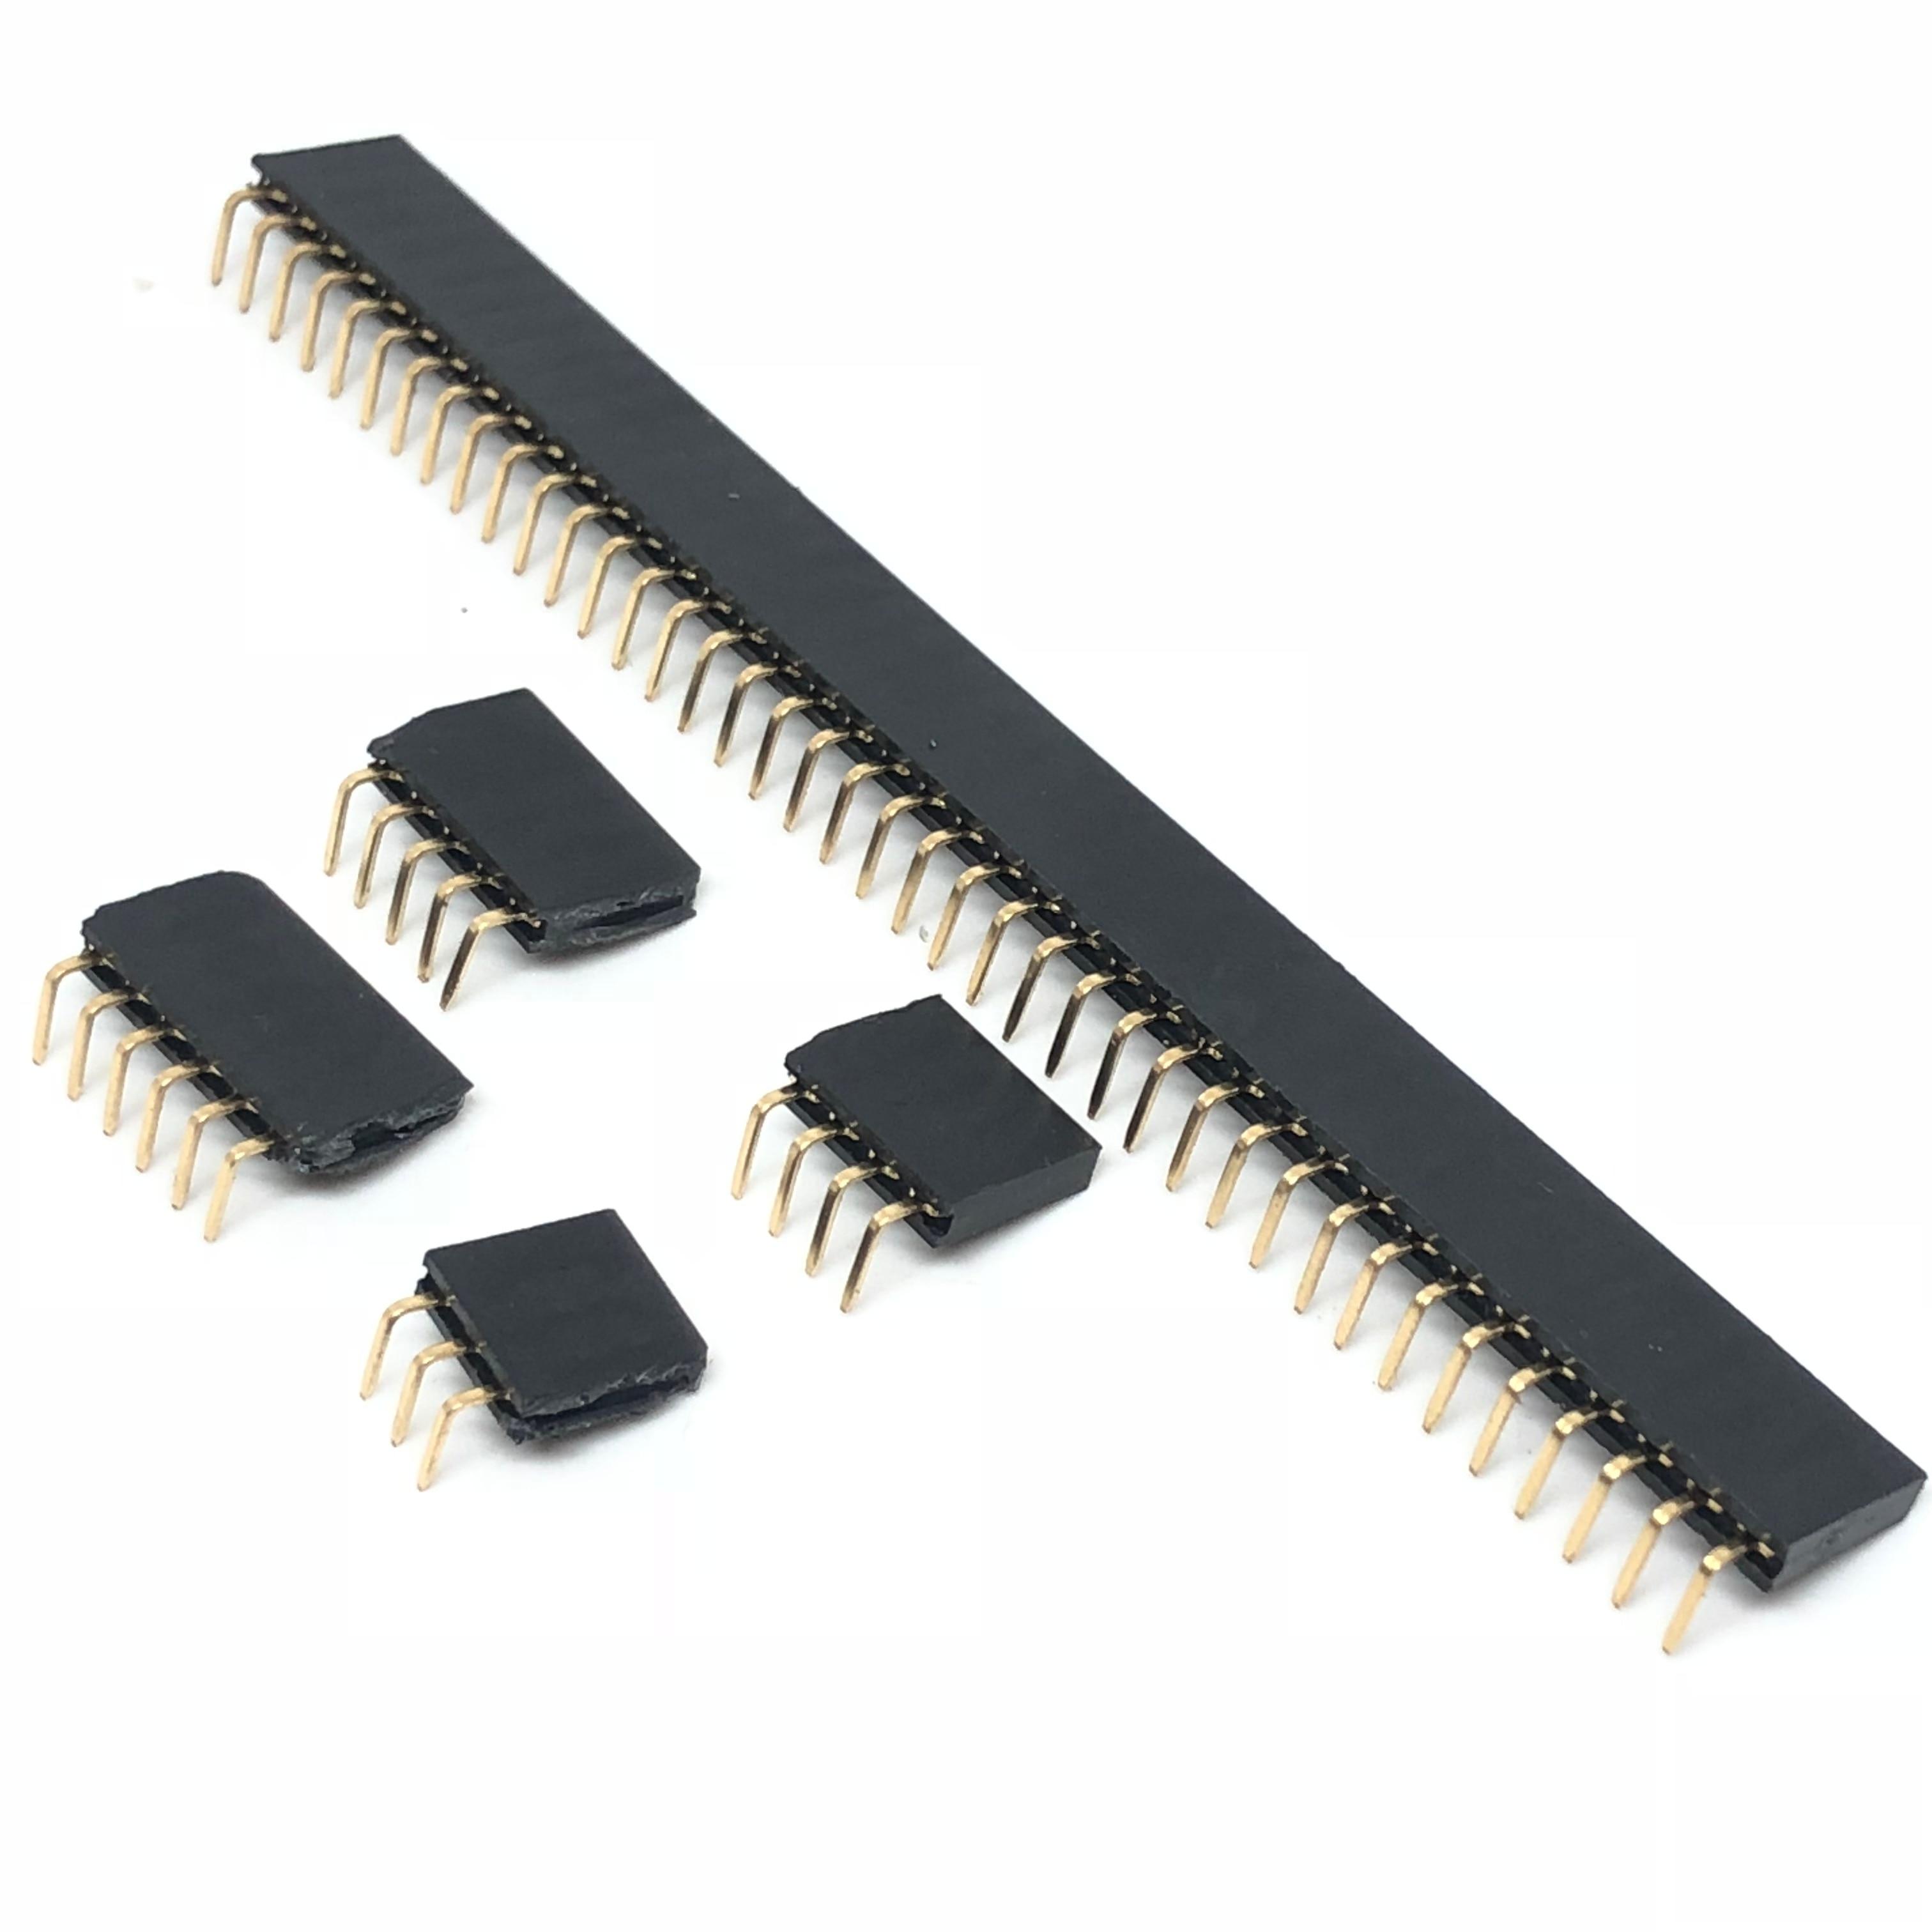 3 PCS 40 Pin 2.54 mm Single Row Female Pin Header